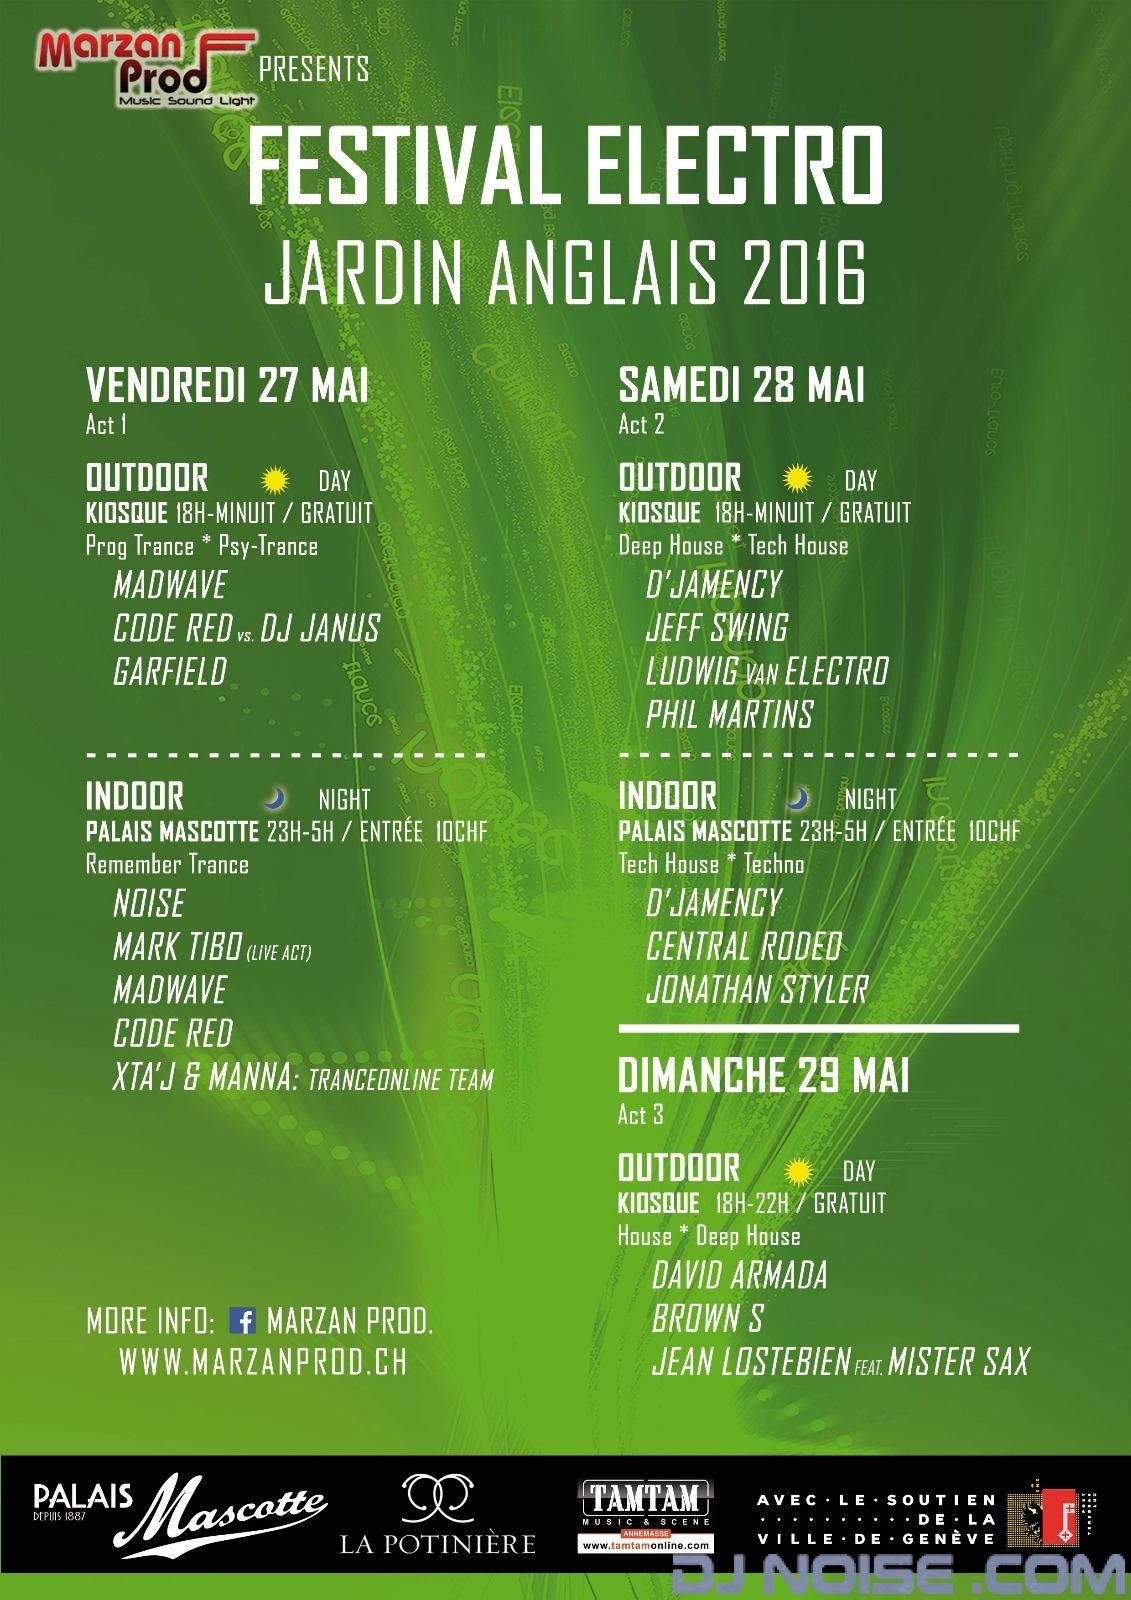 2016.05.27 FestivalElectro2016